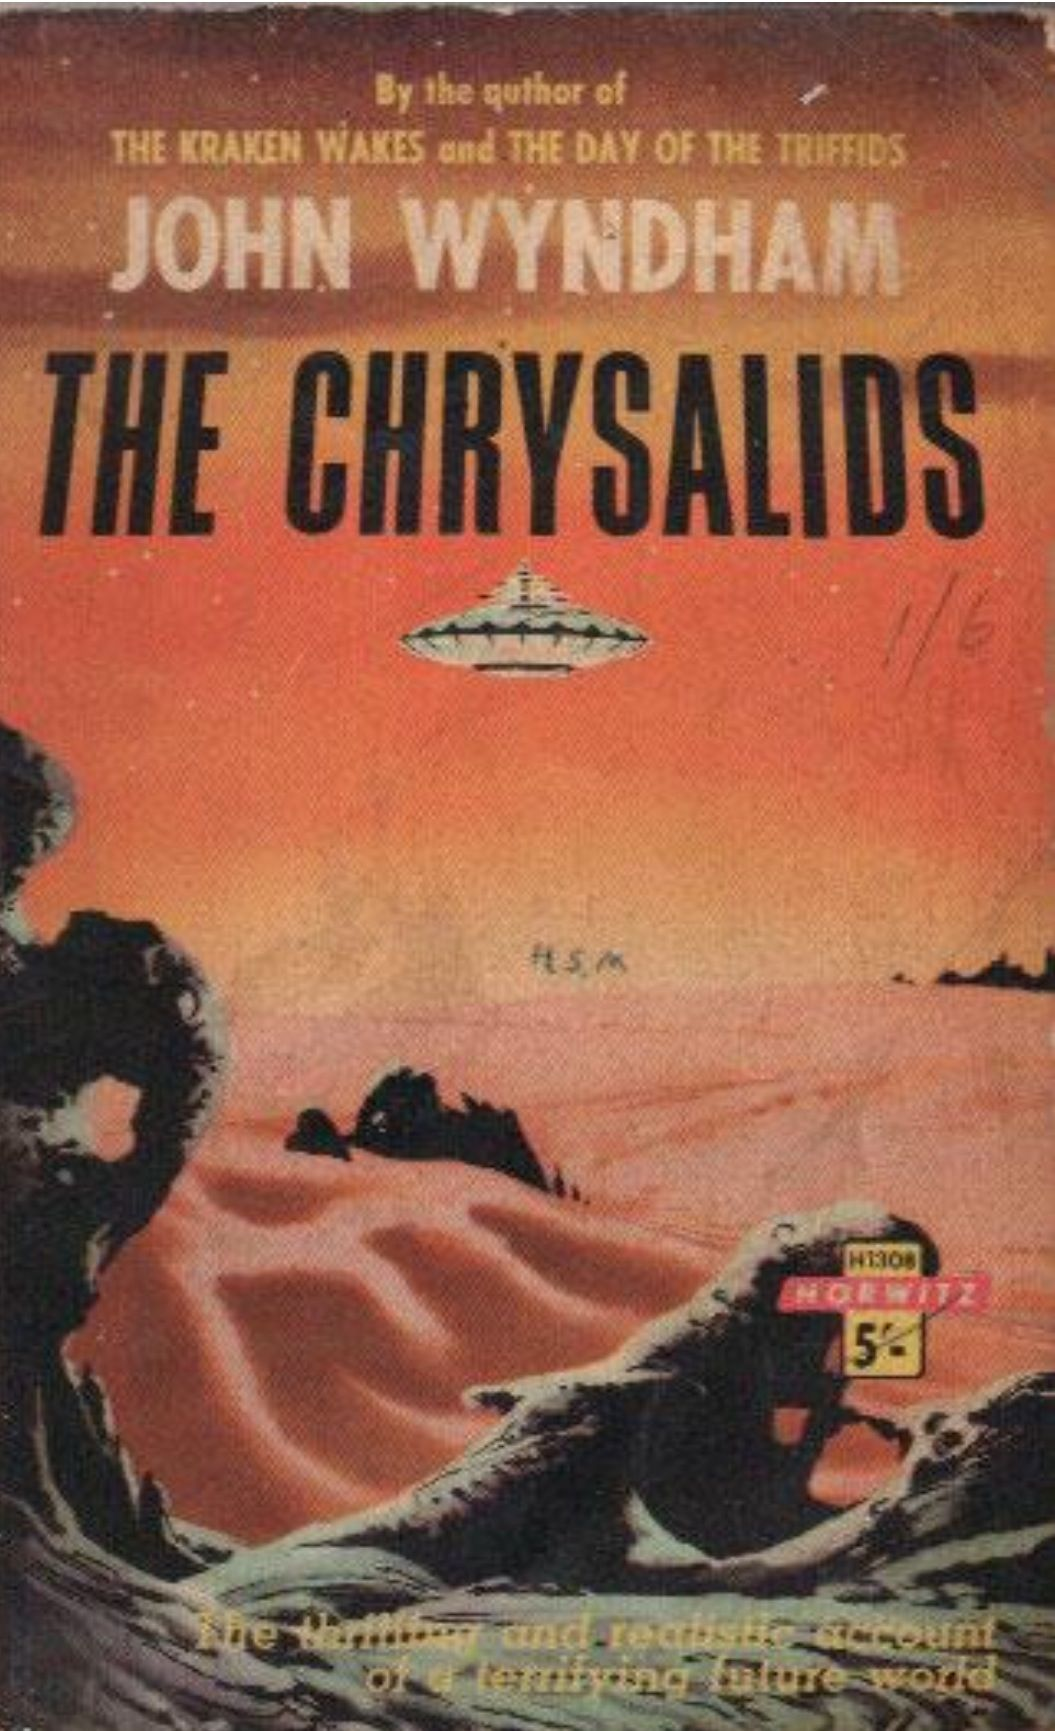 The chrysalids david strorm